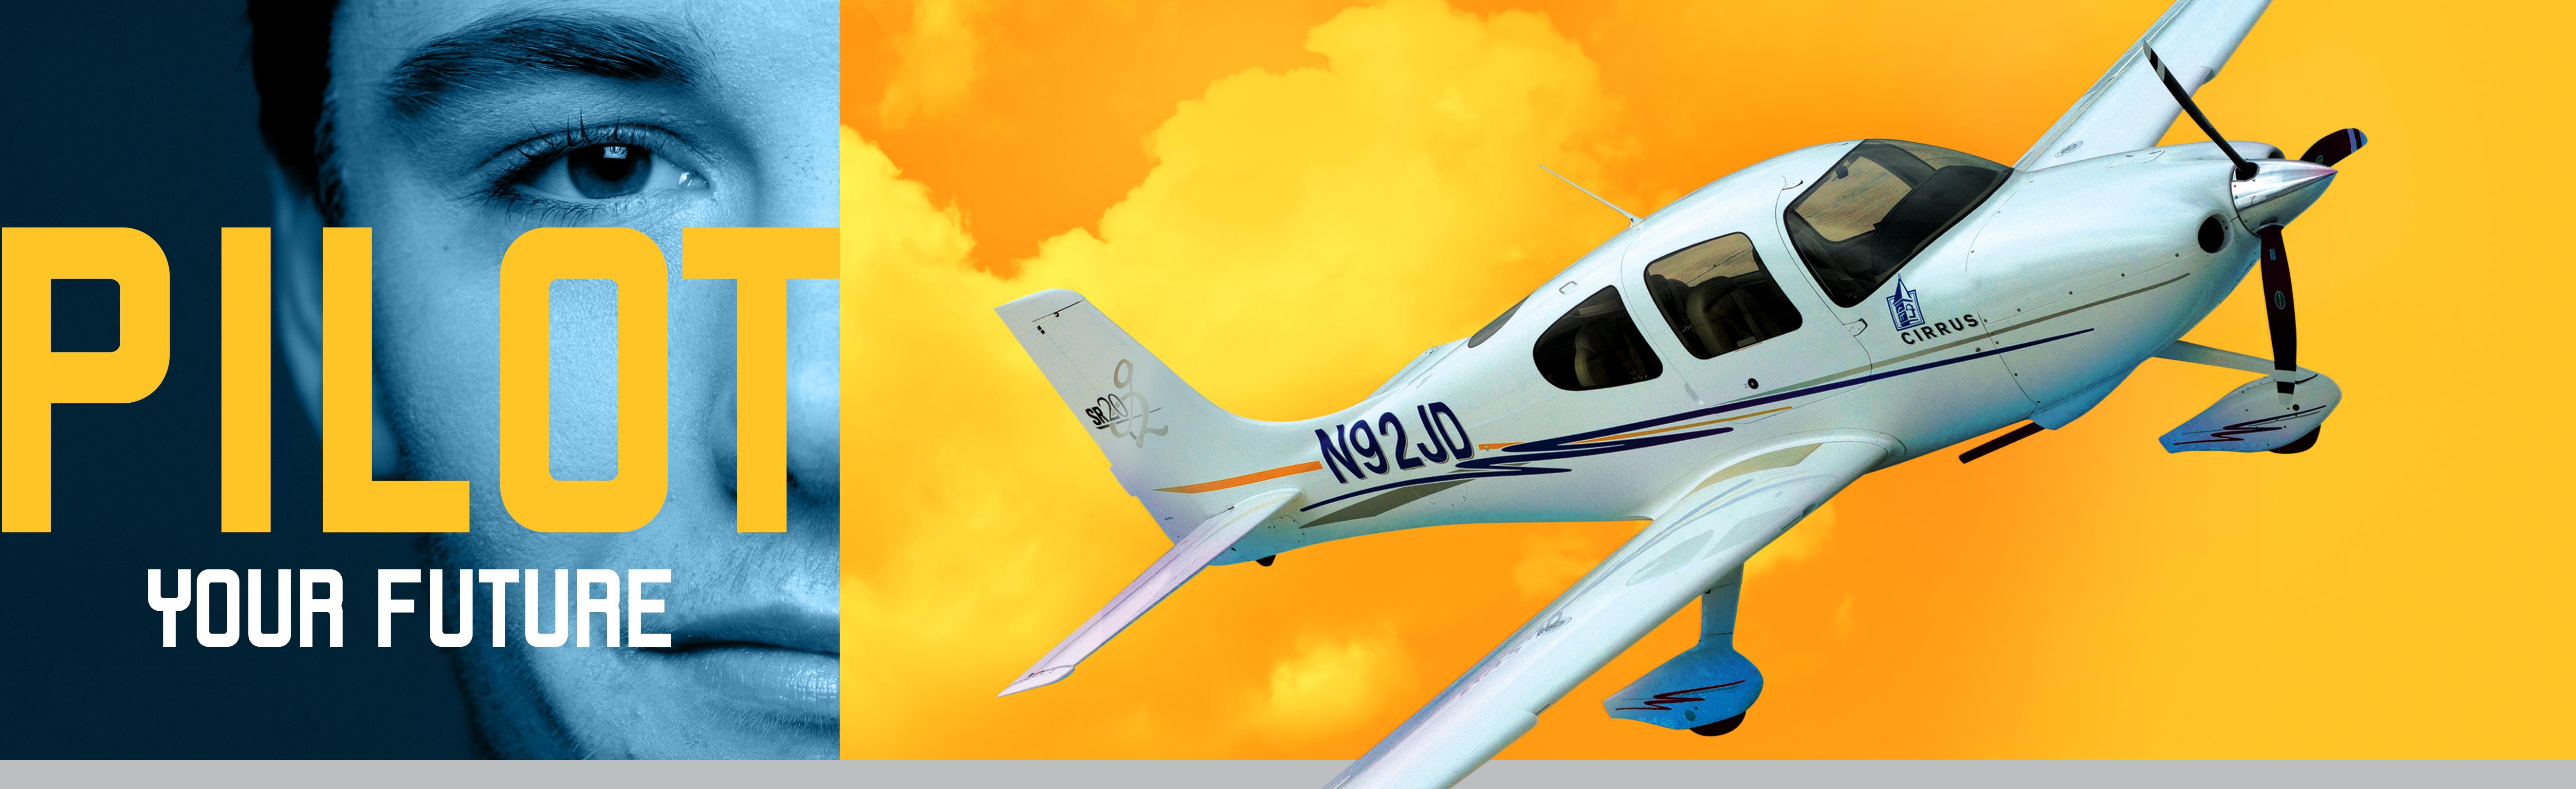 Aviation - Lakeland University, Sheboygan, Wisconsin